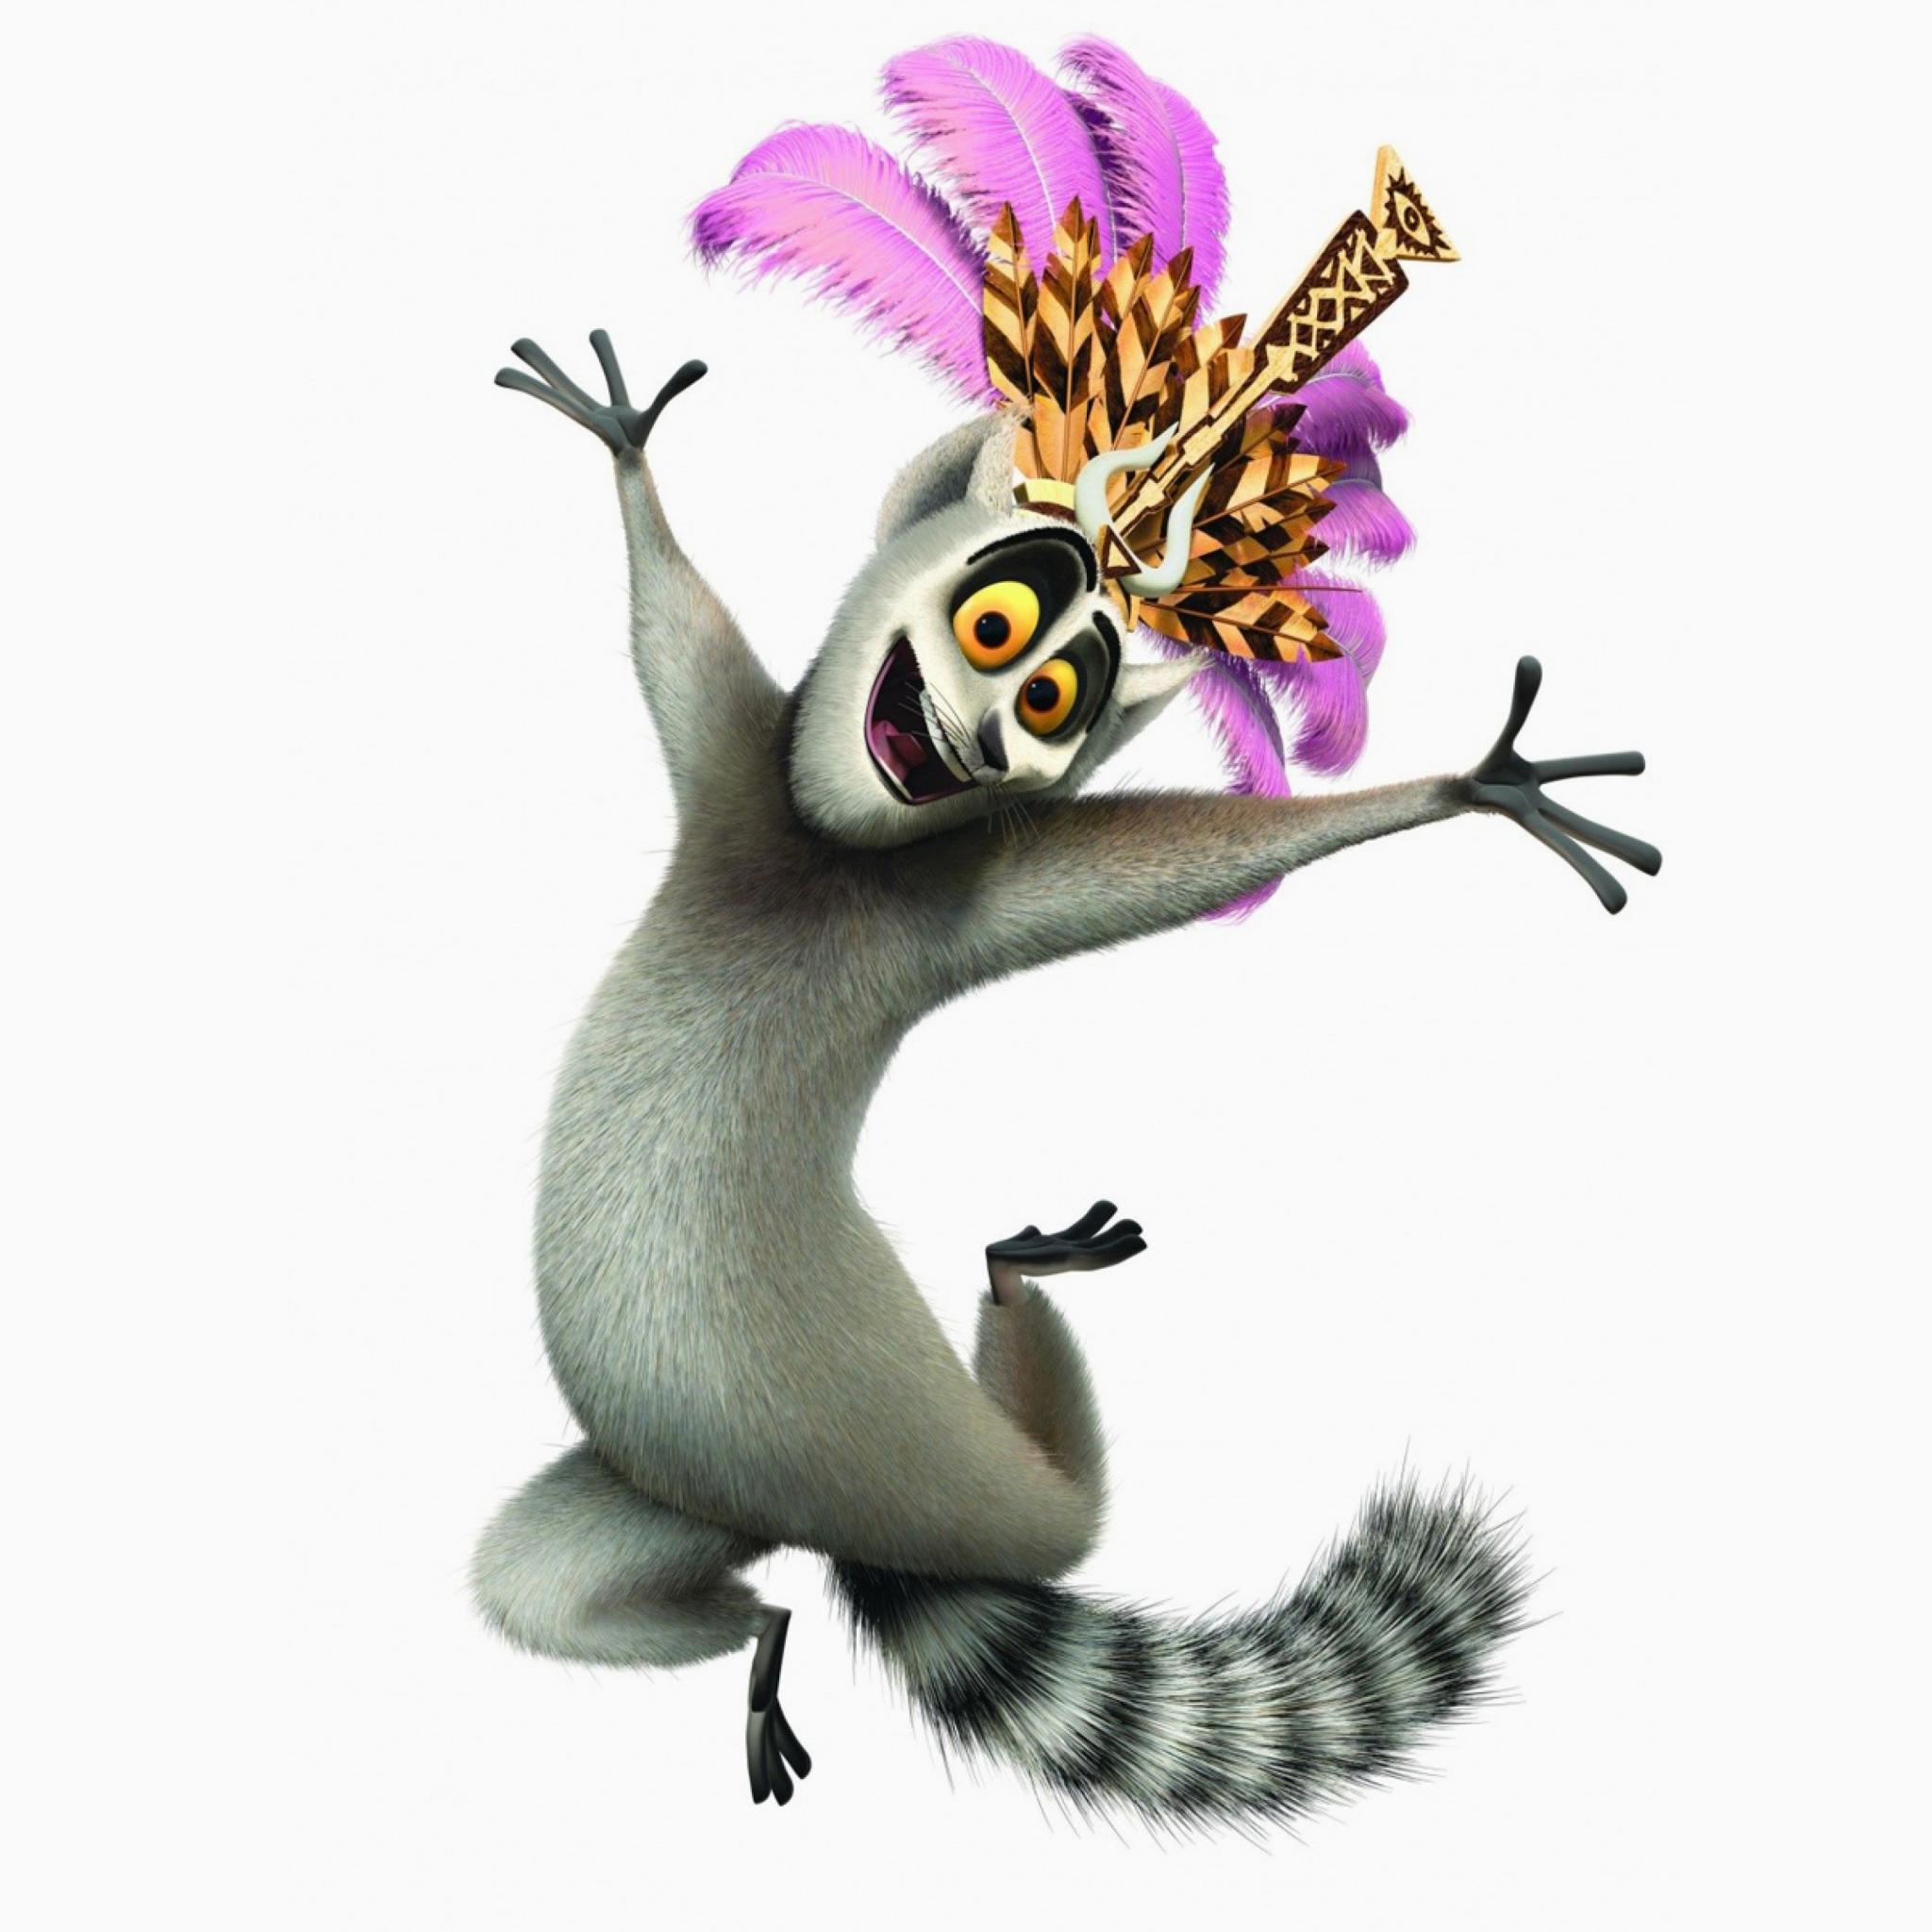 Lemur King From Madagascar Wallpaper For 2048x2048